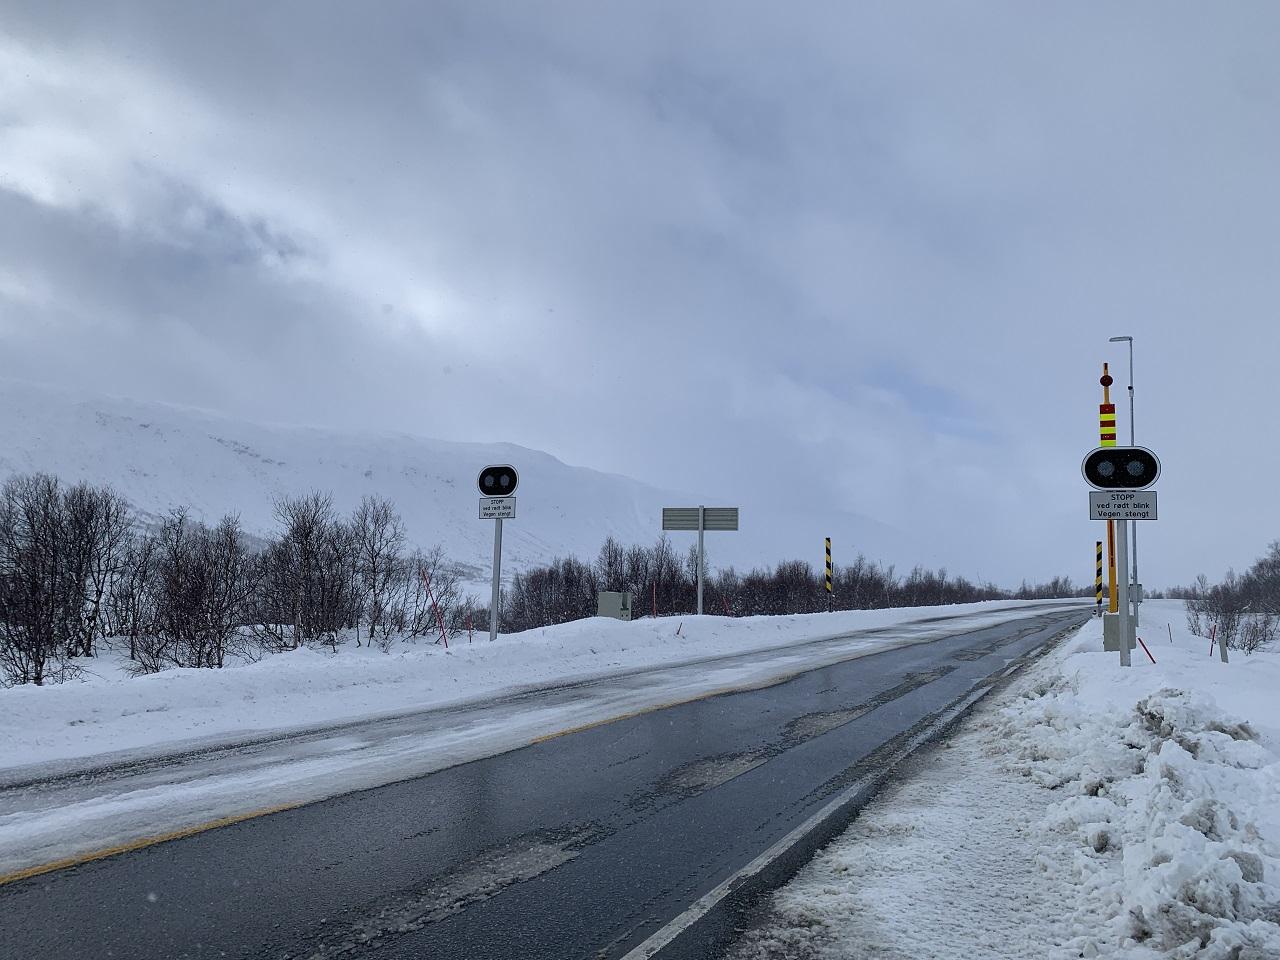 Bom - Rv 15 - Grotli - Strynefjellet - Innlandet fylke